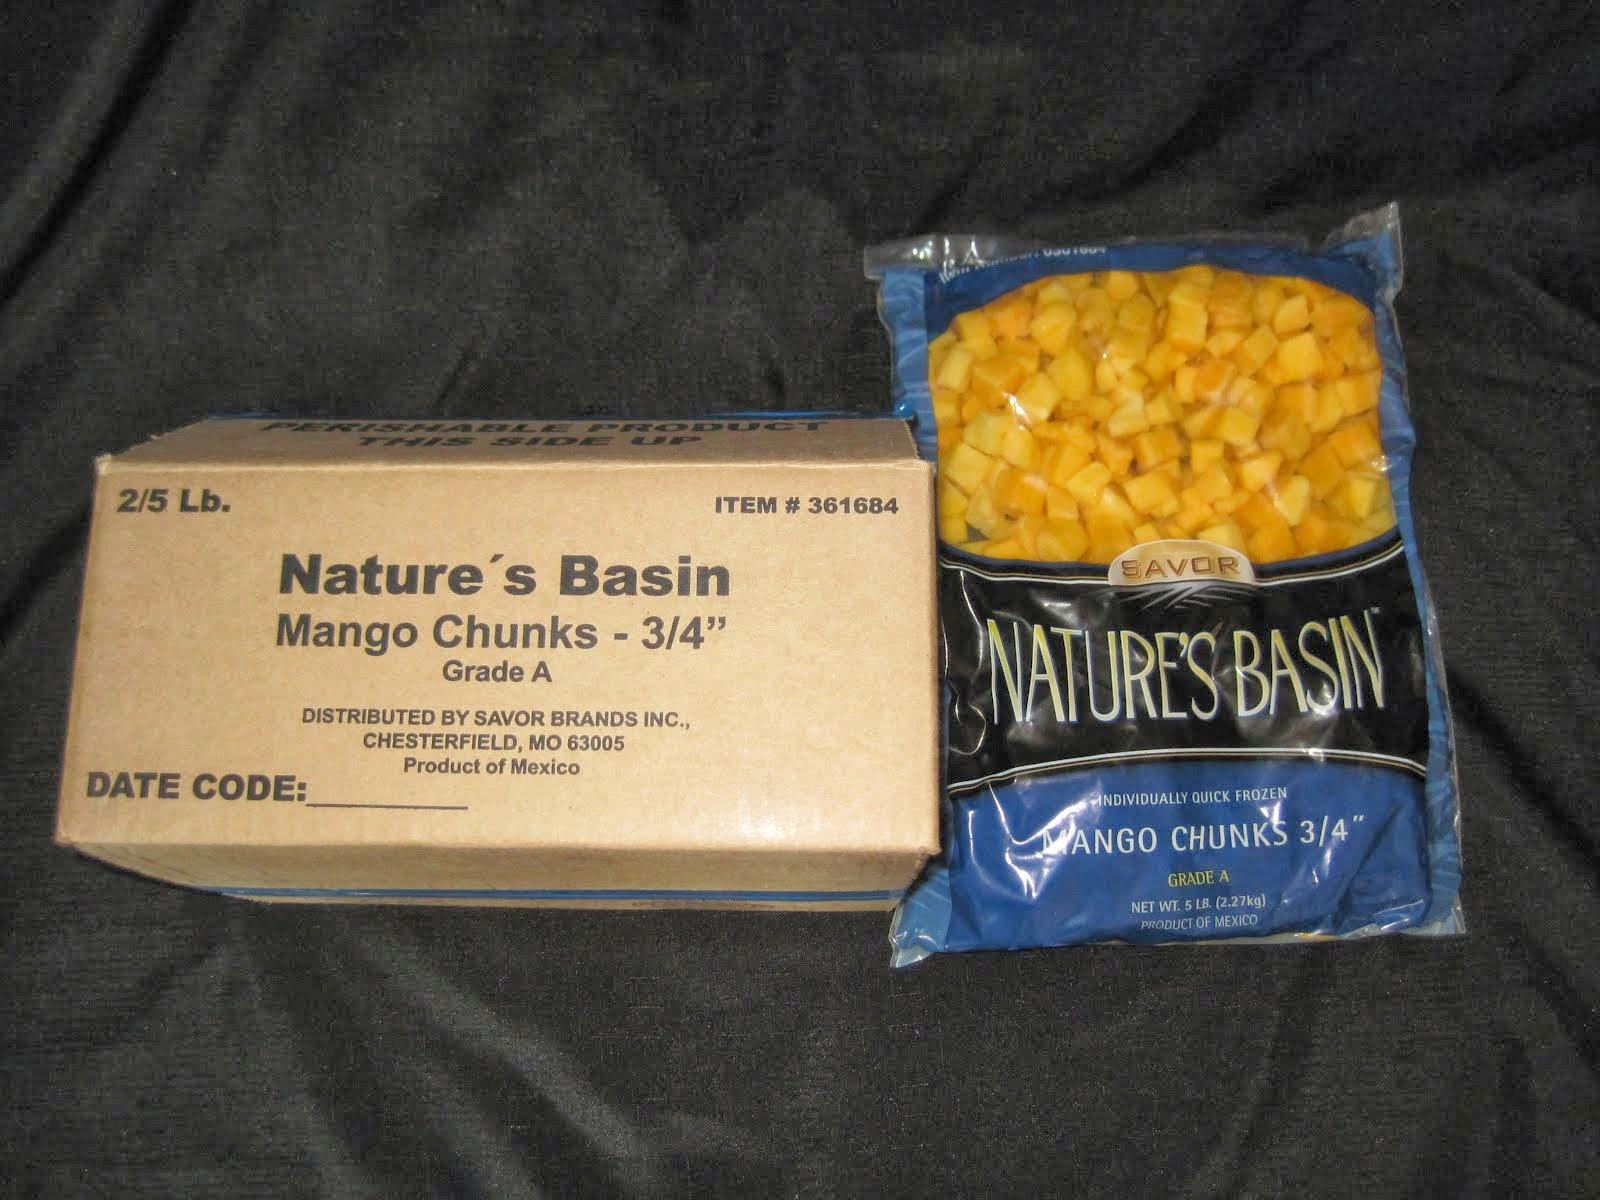 Mango Chunks 2/5 lb bags - Item # 25145